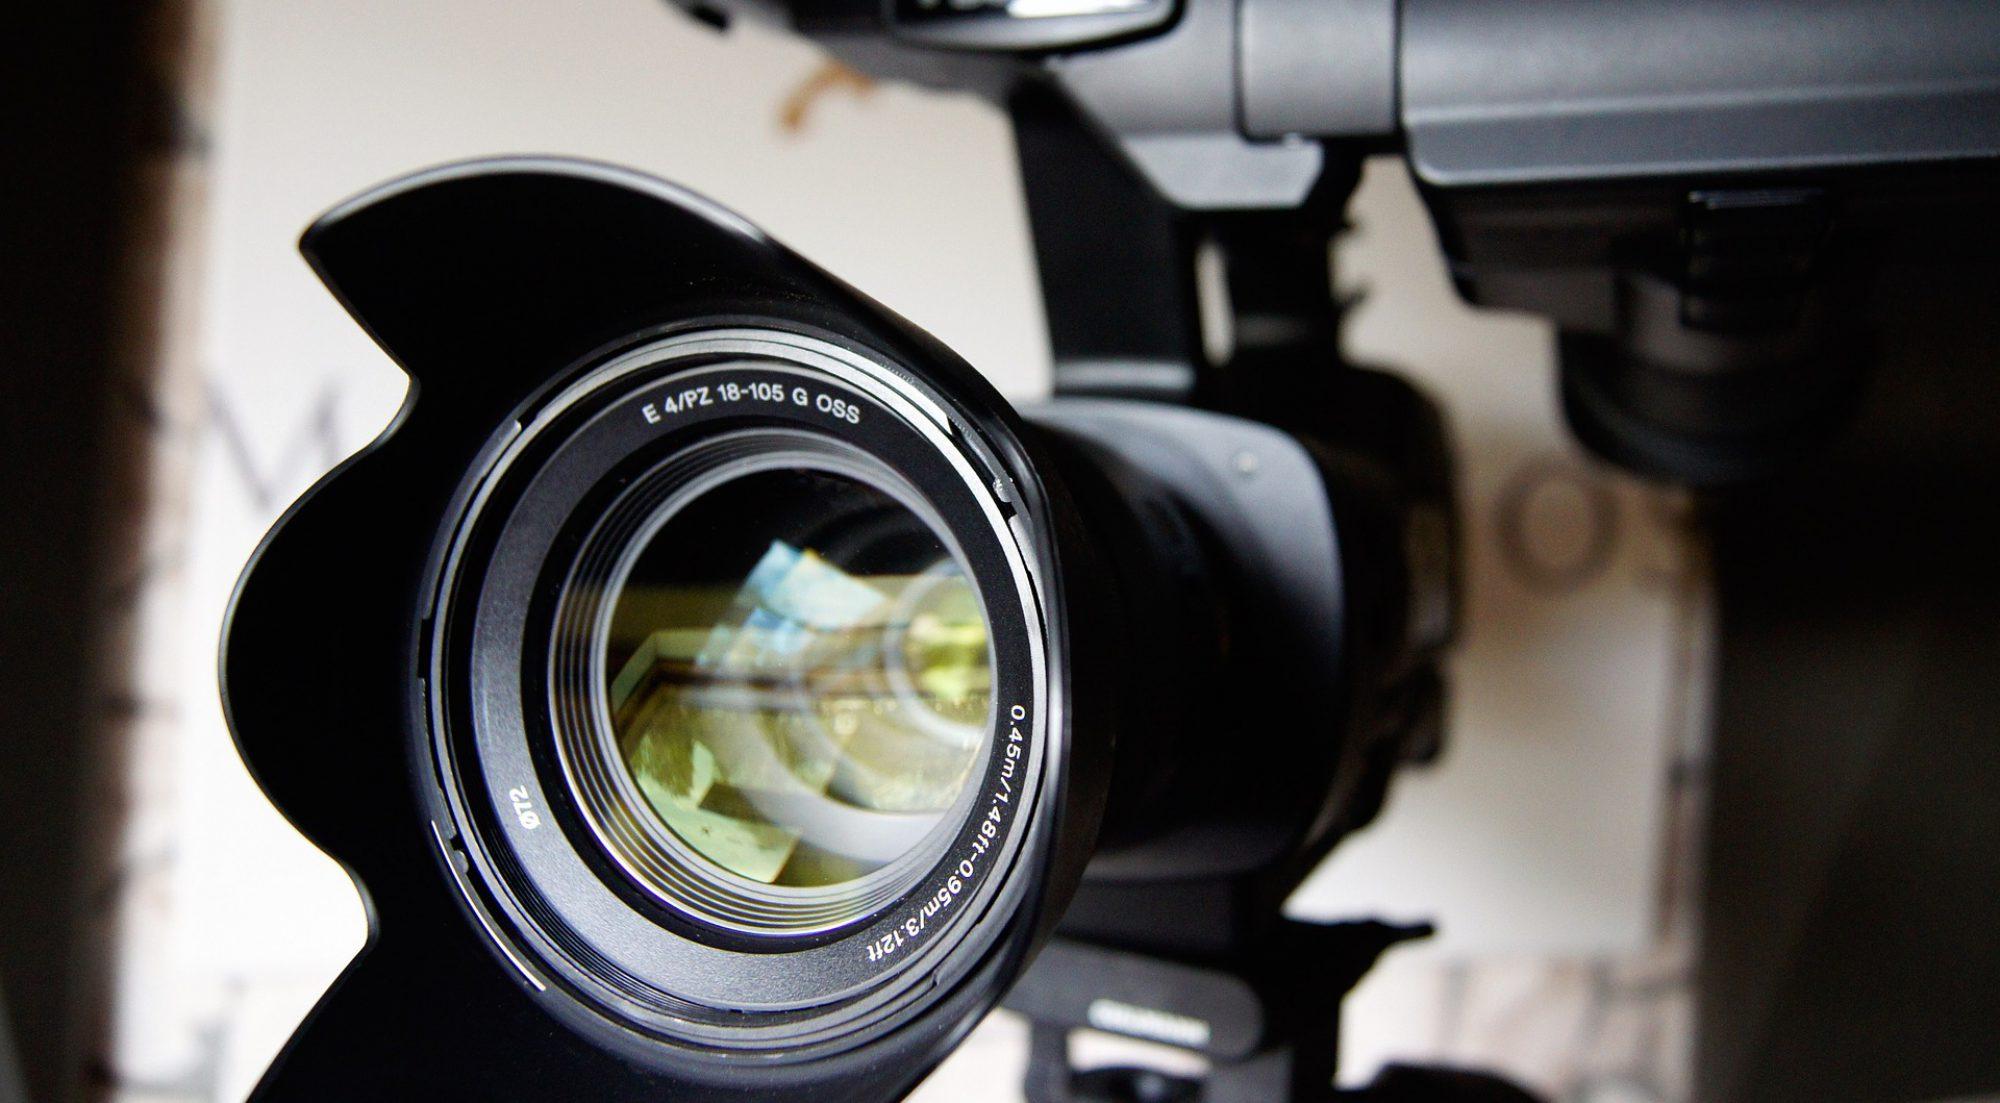 Paul B. Brown | Video Producer